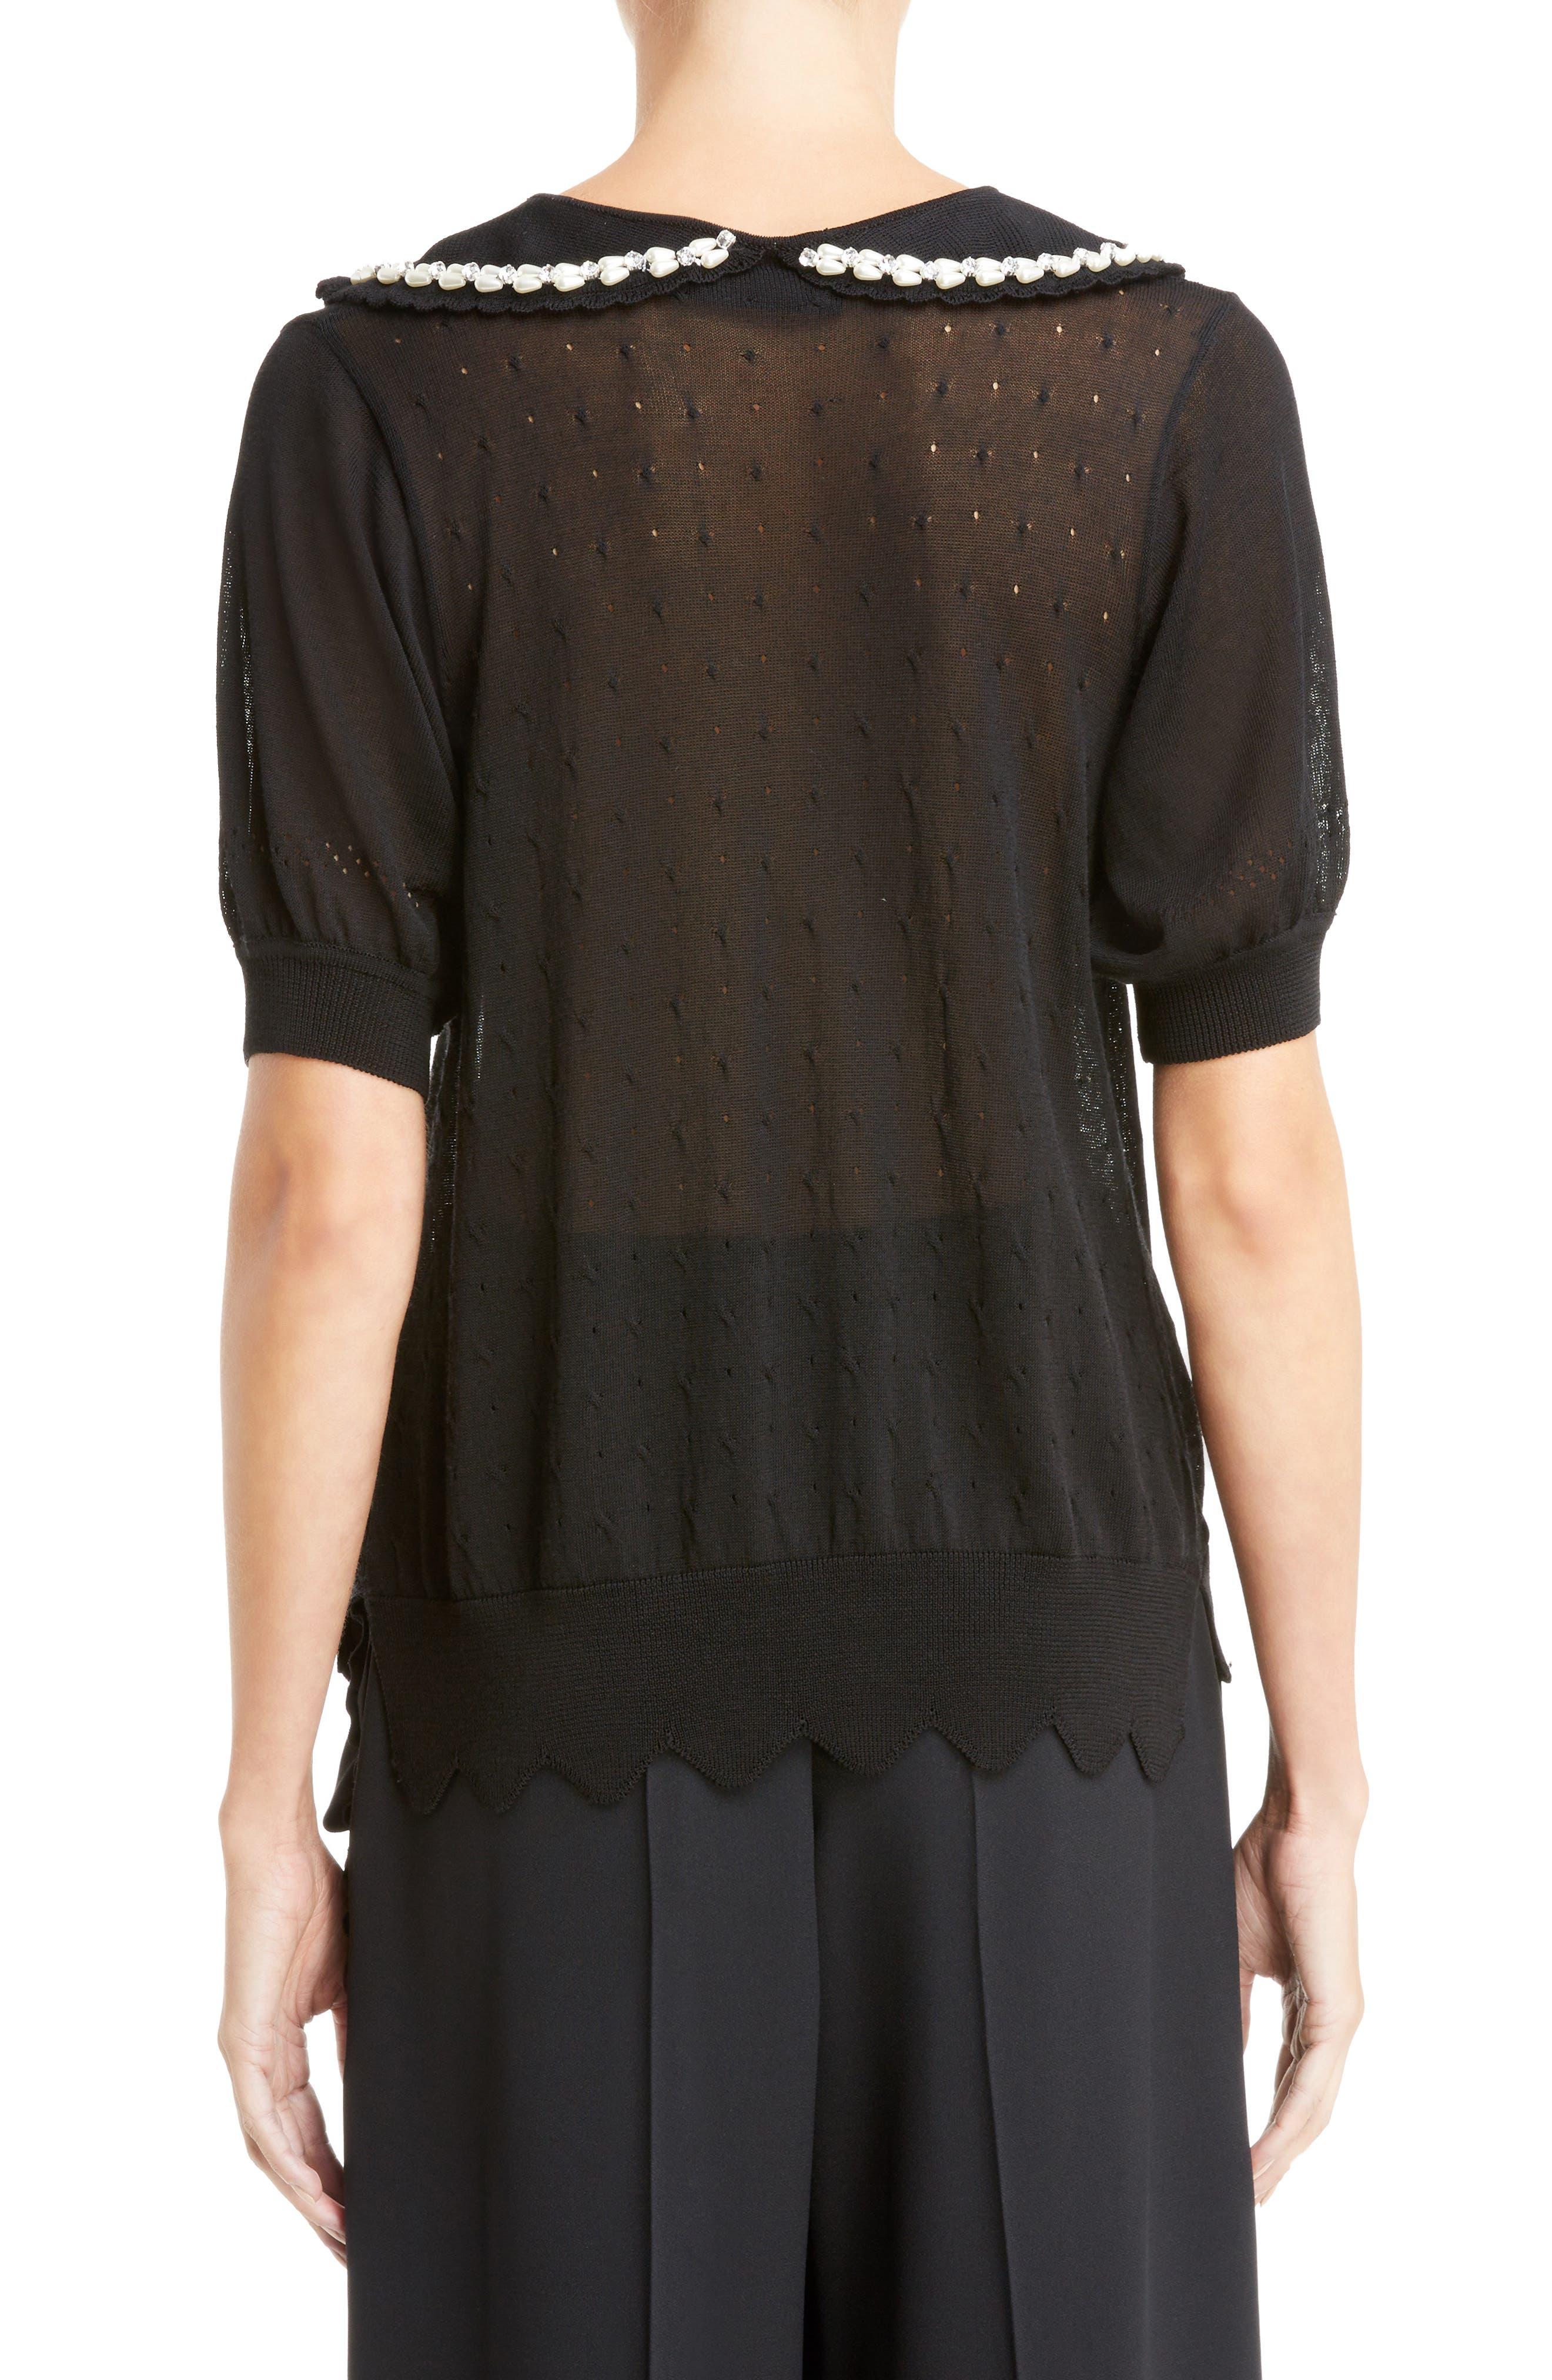 Beaded Lace Knit Cardigan,                             Alternate thumbnail 2, color,                             Black